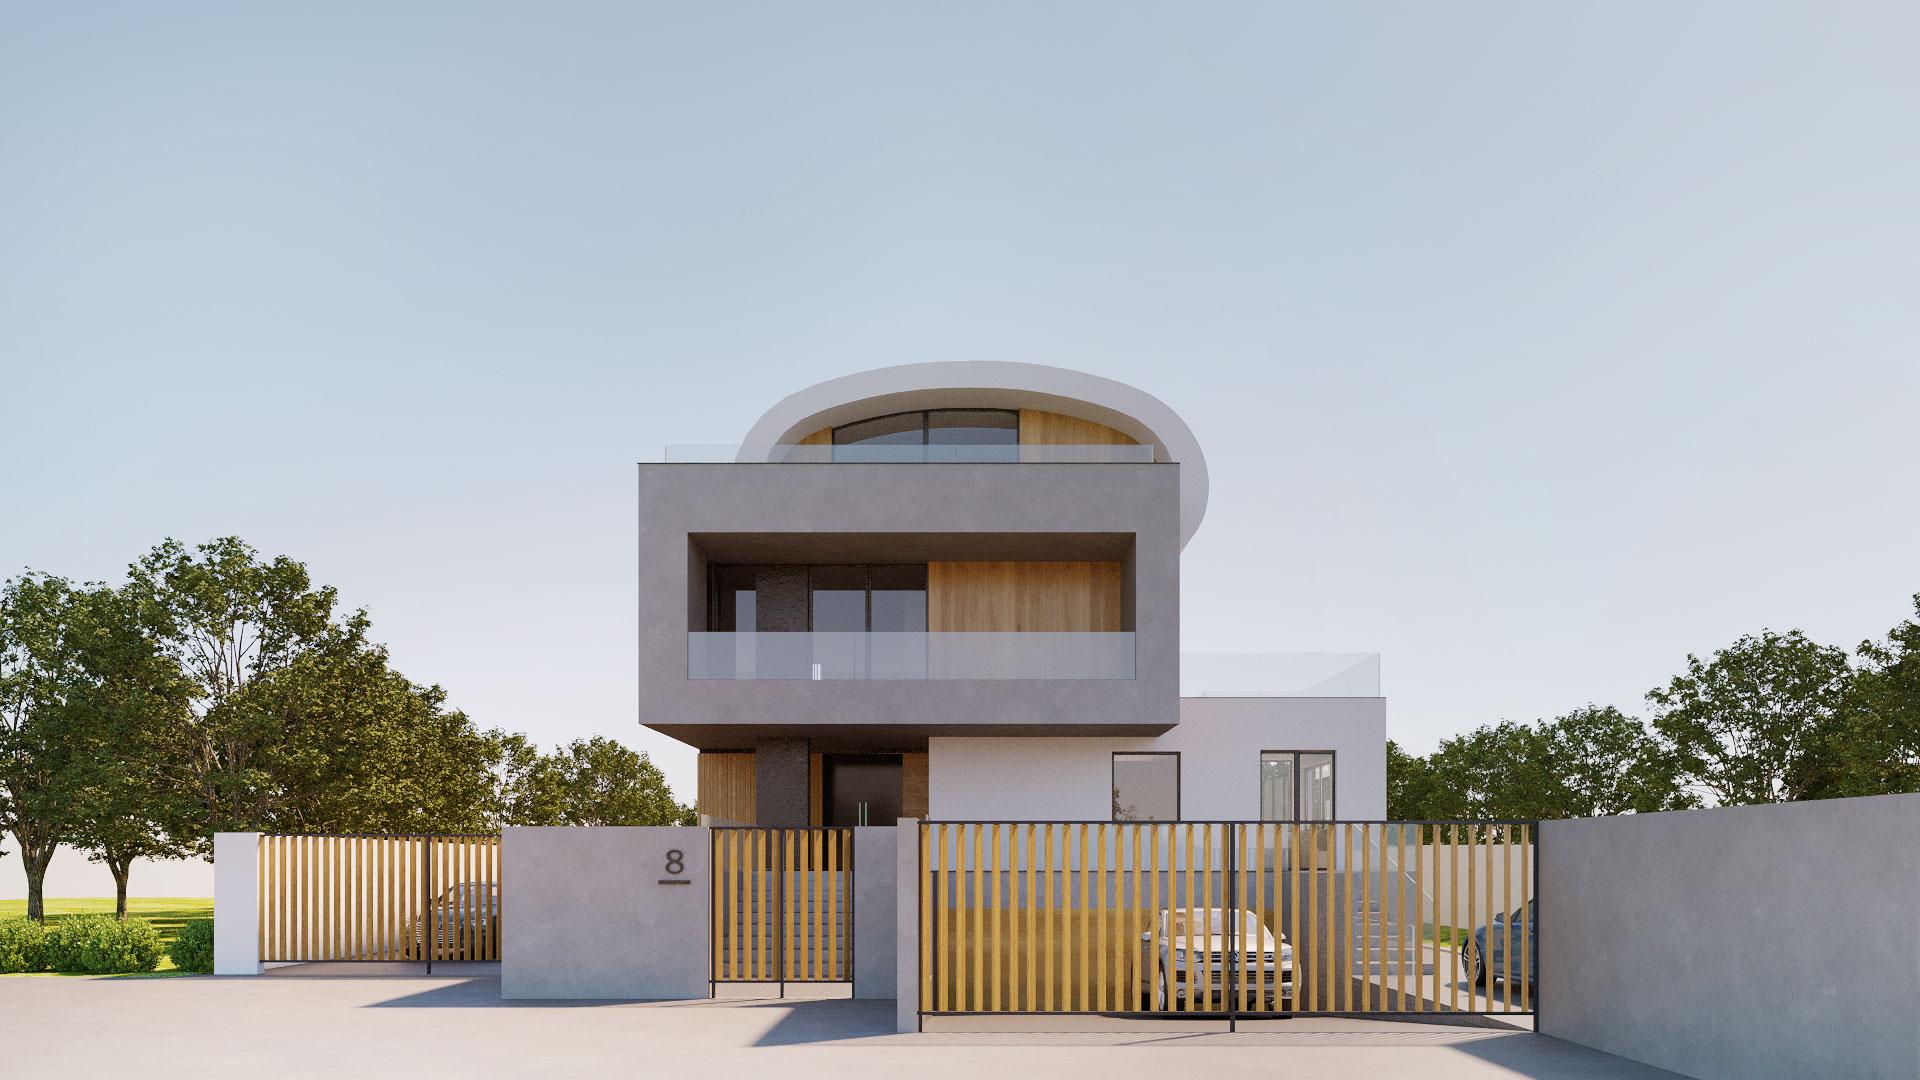 https://nbc-arhitect.ro/wp-content/uploads/2020/10/NBC-Arhitect-_-residences-_-Mogo-Villa-2-_-Romania-_-exterior-view_3.jpg